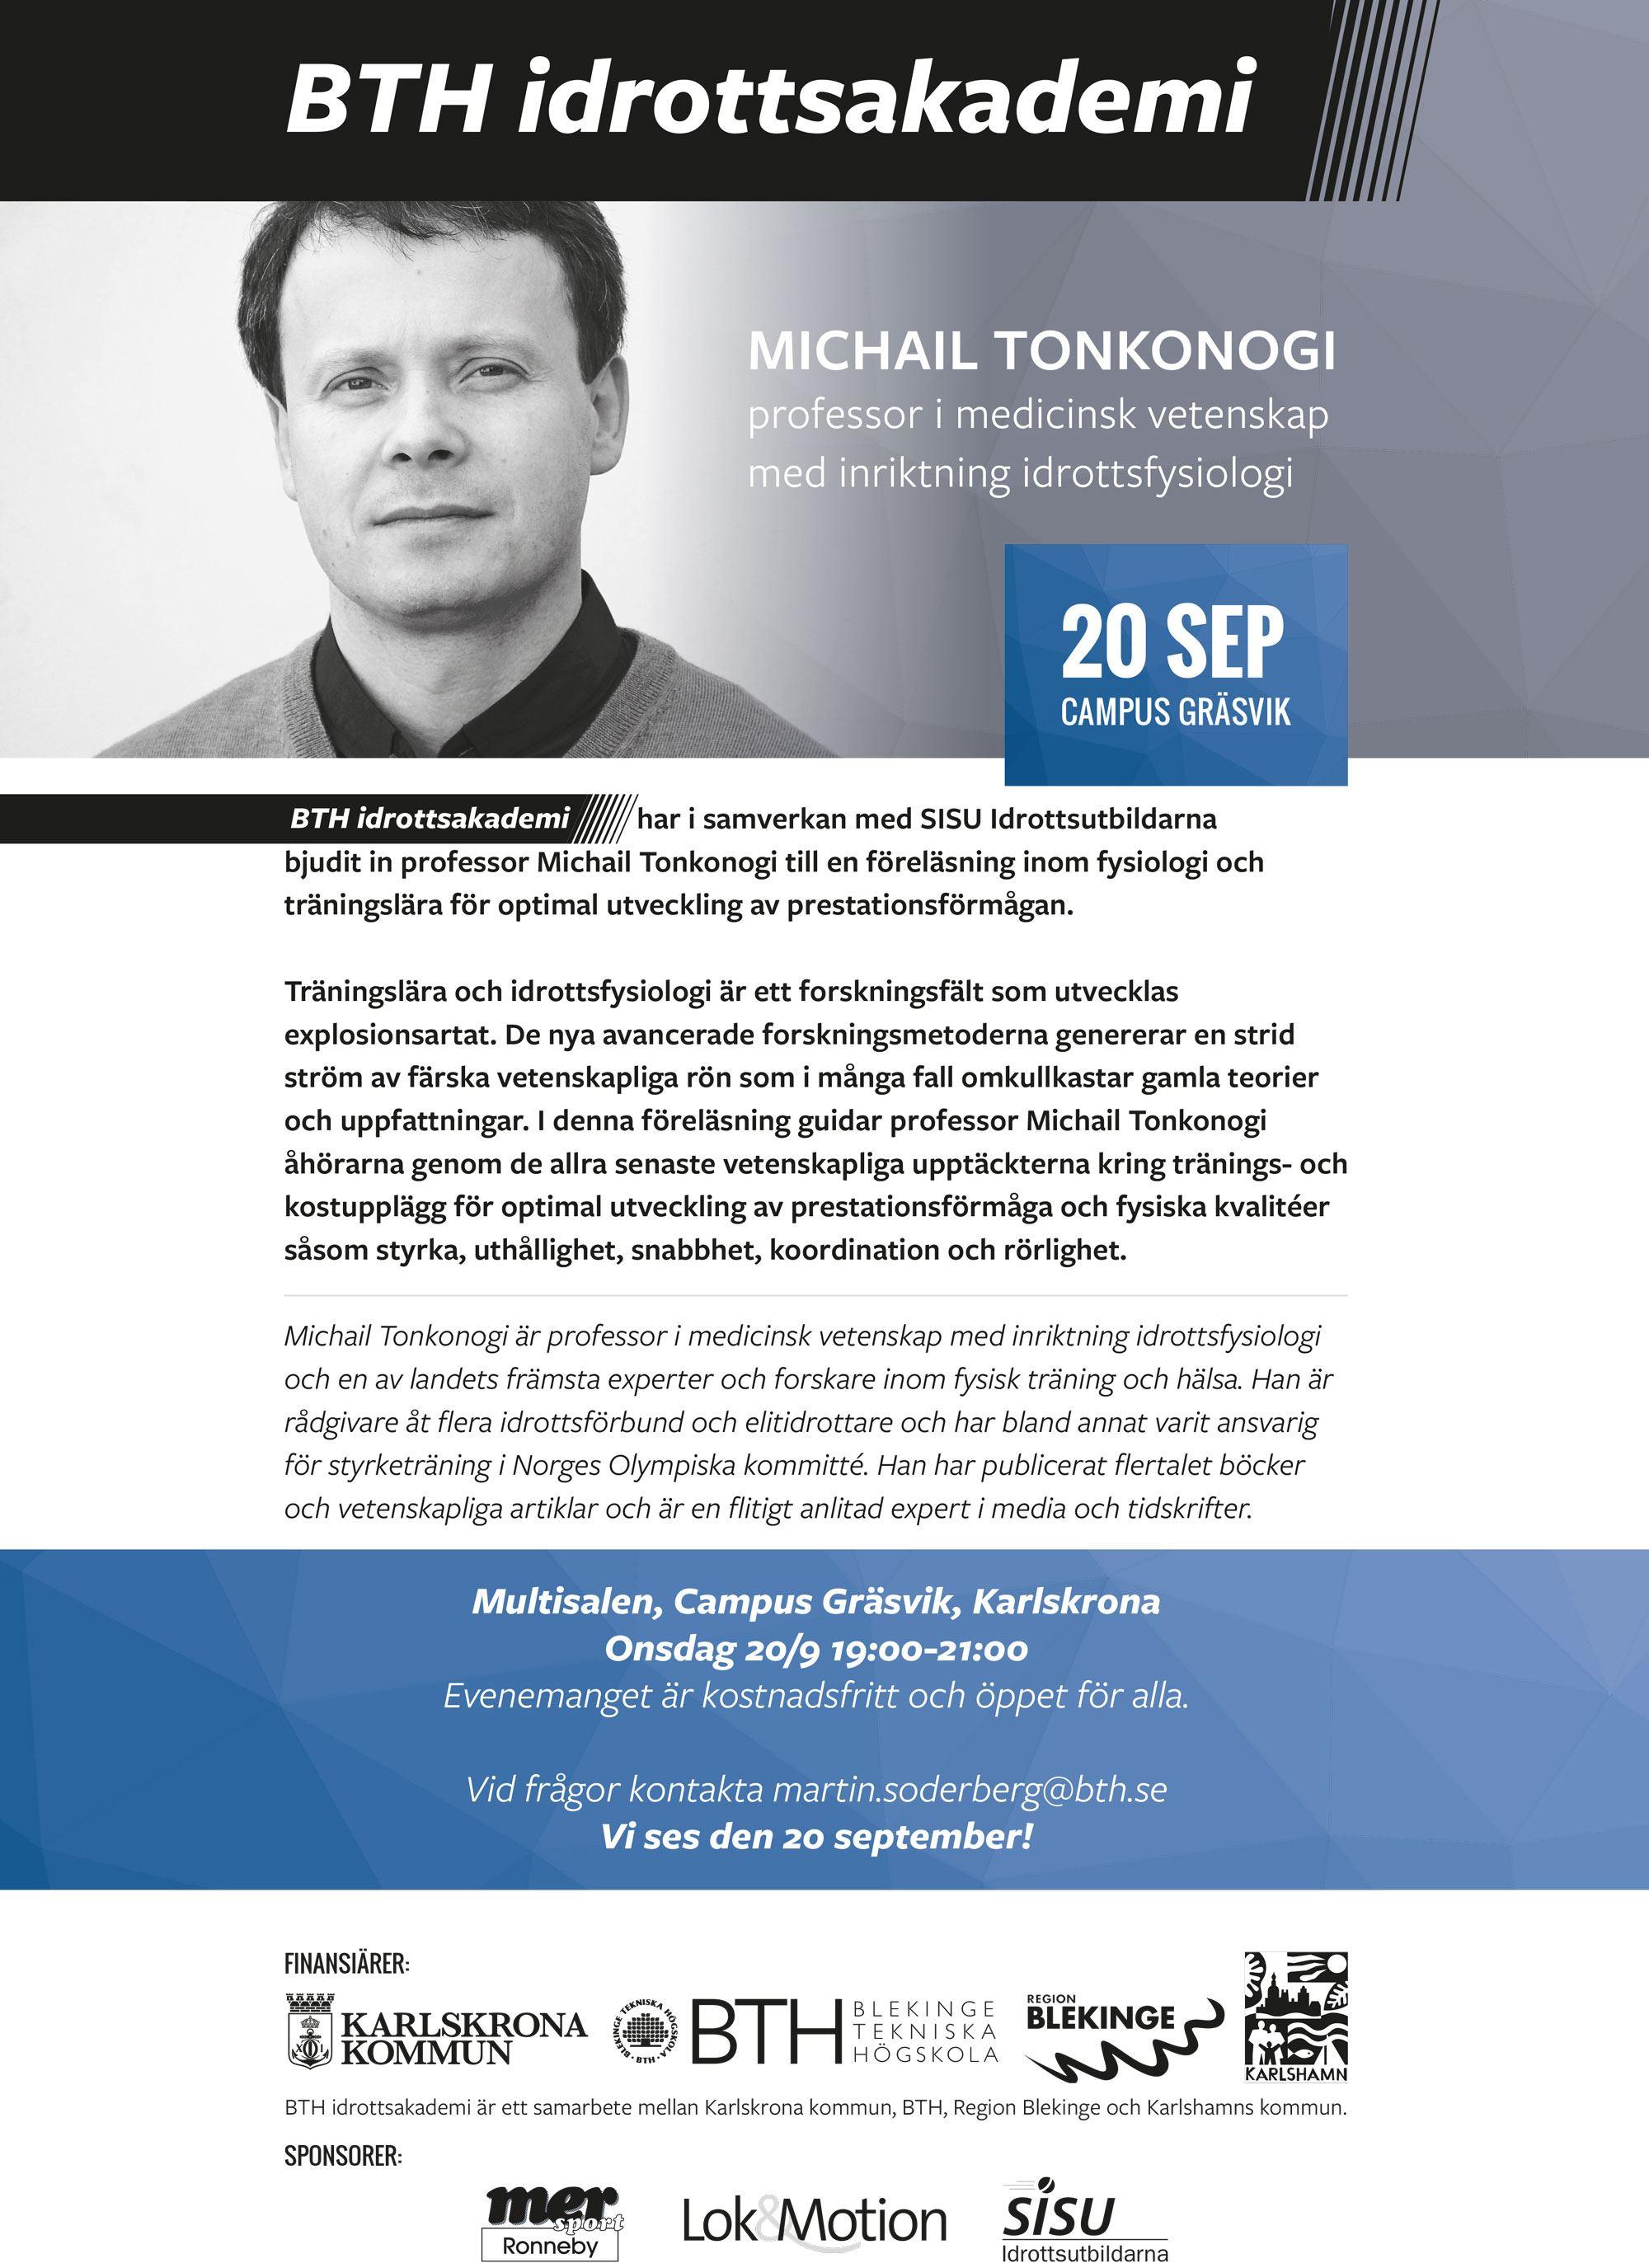 Föreläsning - Michail Tonkonogi Idrottsmedicin